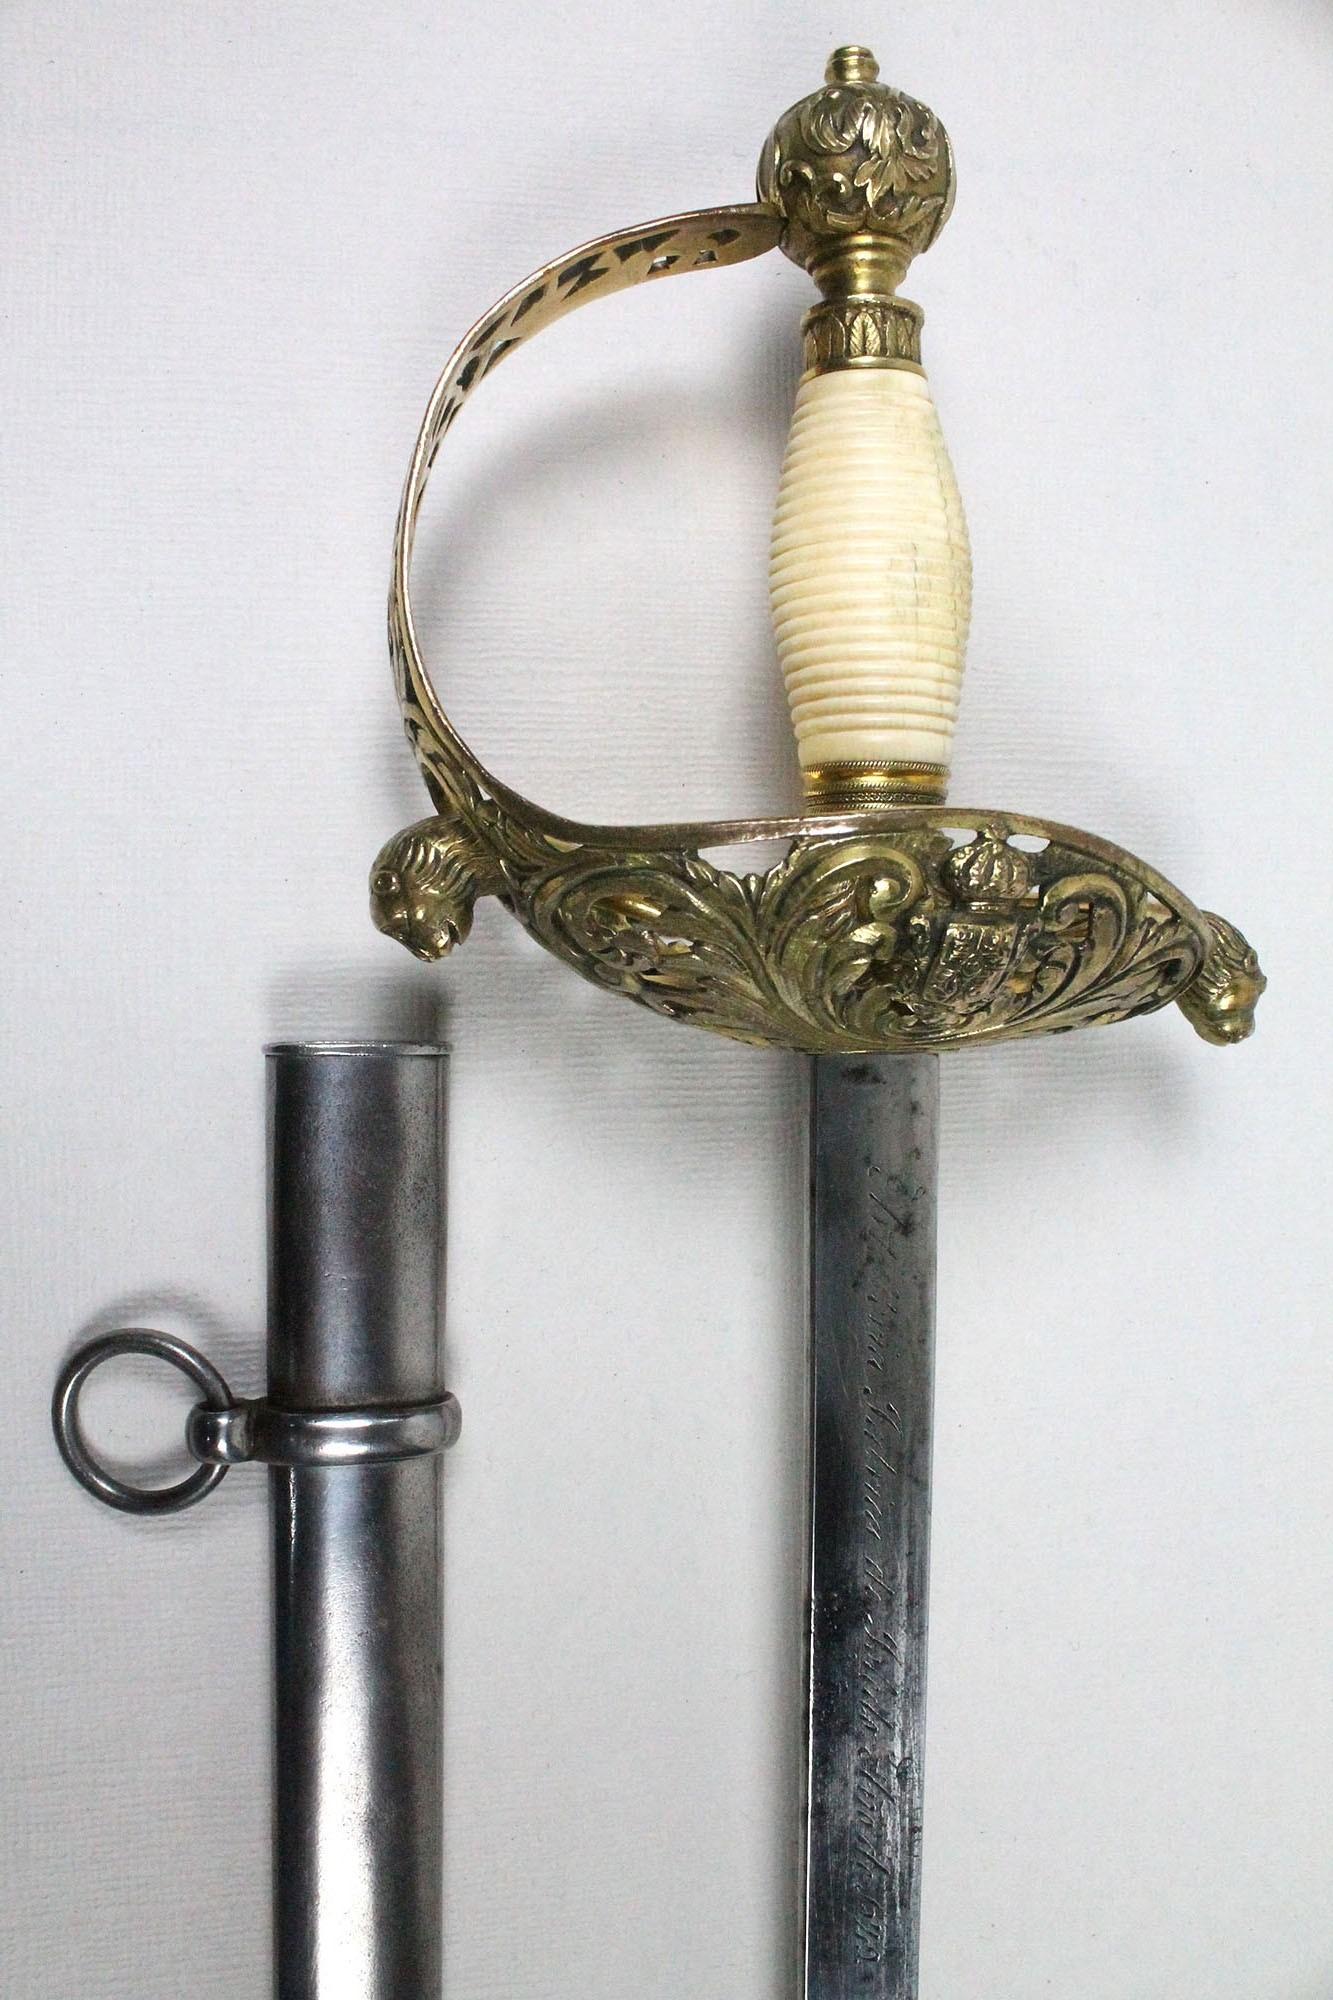 ESP-OFICIAL GENERAL VARIANTE MODELO 1870